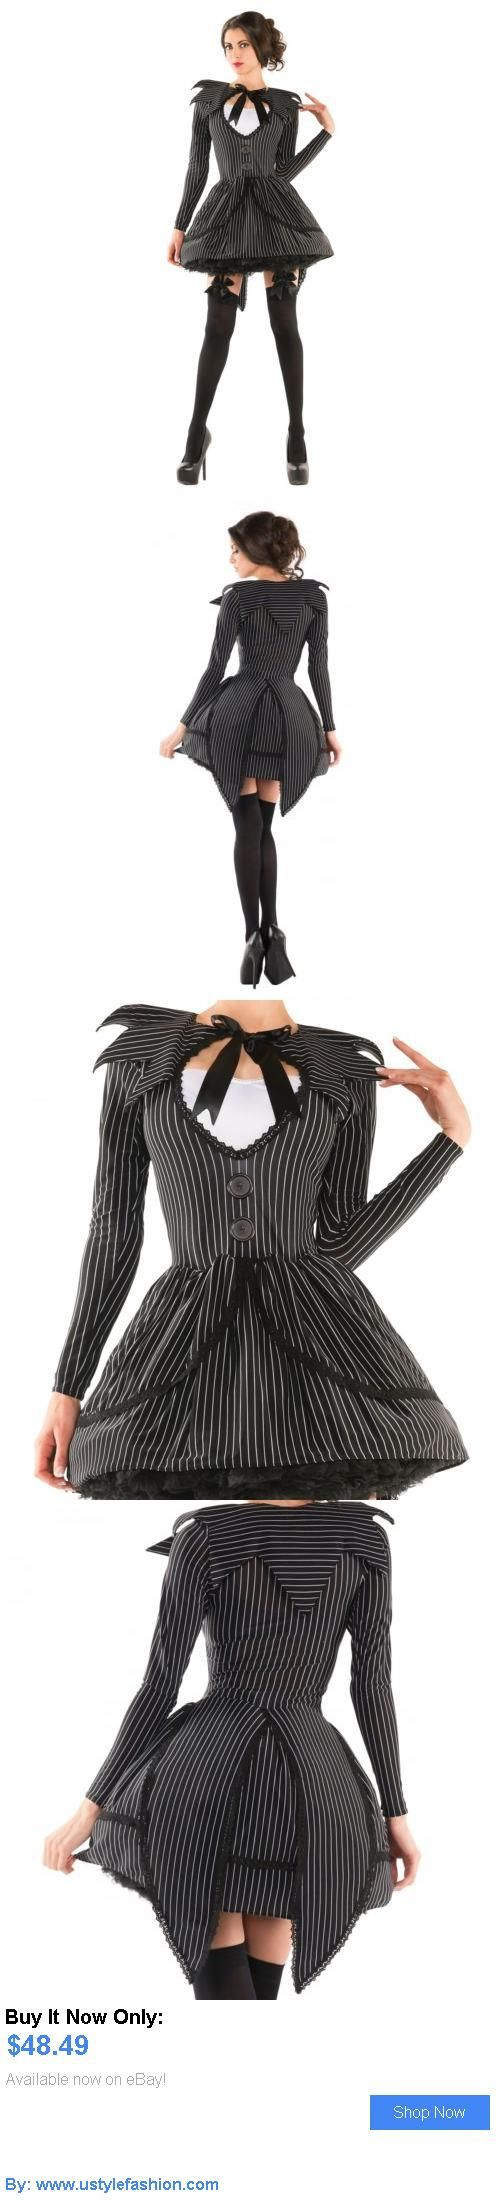 Costumes and reenactment attire: Jack Skellington Costume Adult Female Halloween Fancy Dress BUY IT NOW ONLY: $48.49 #ustylefashionCostumesandreenactmentattire OR #ustylefashion